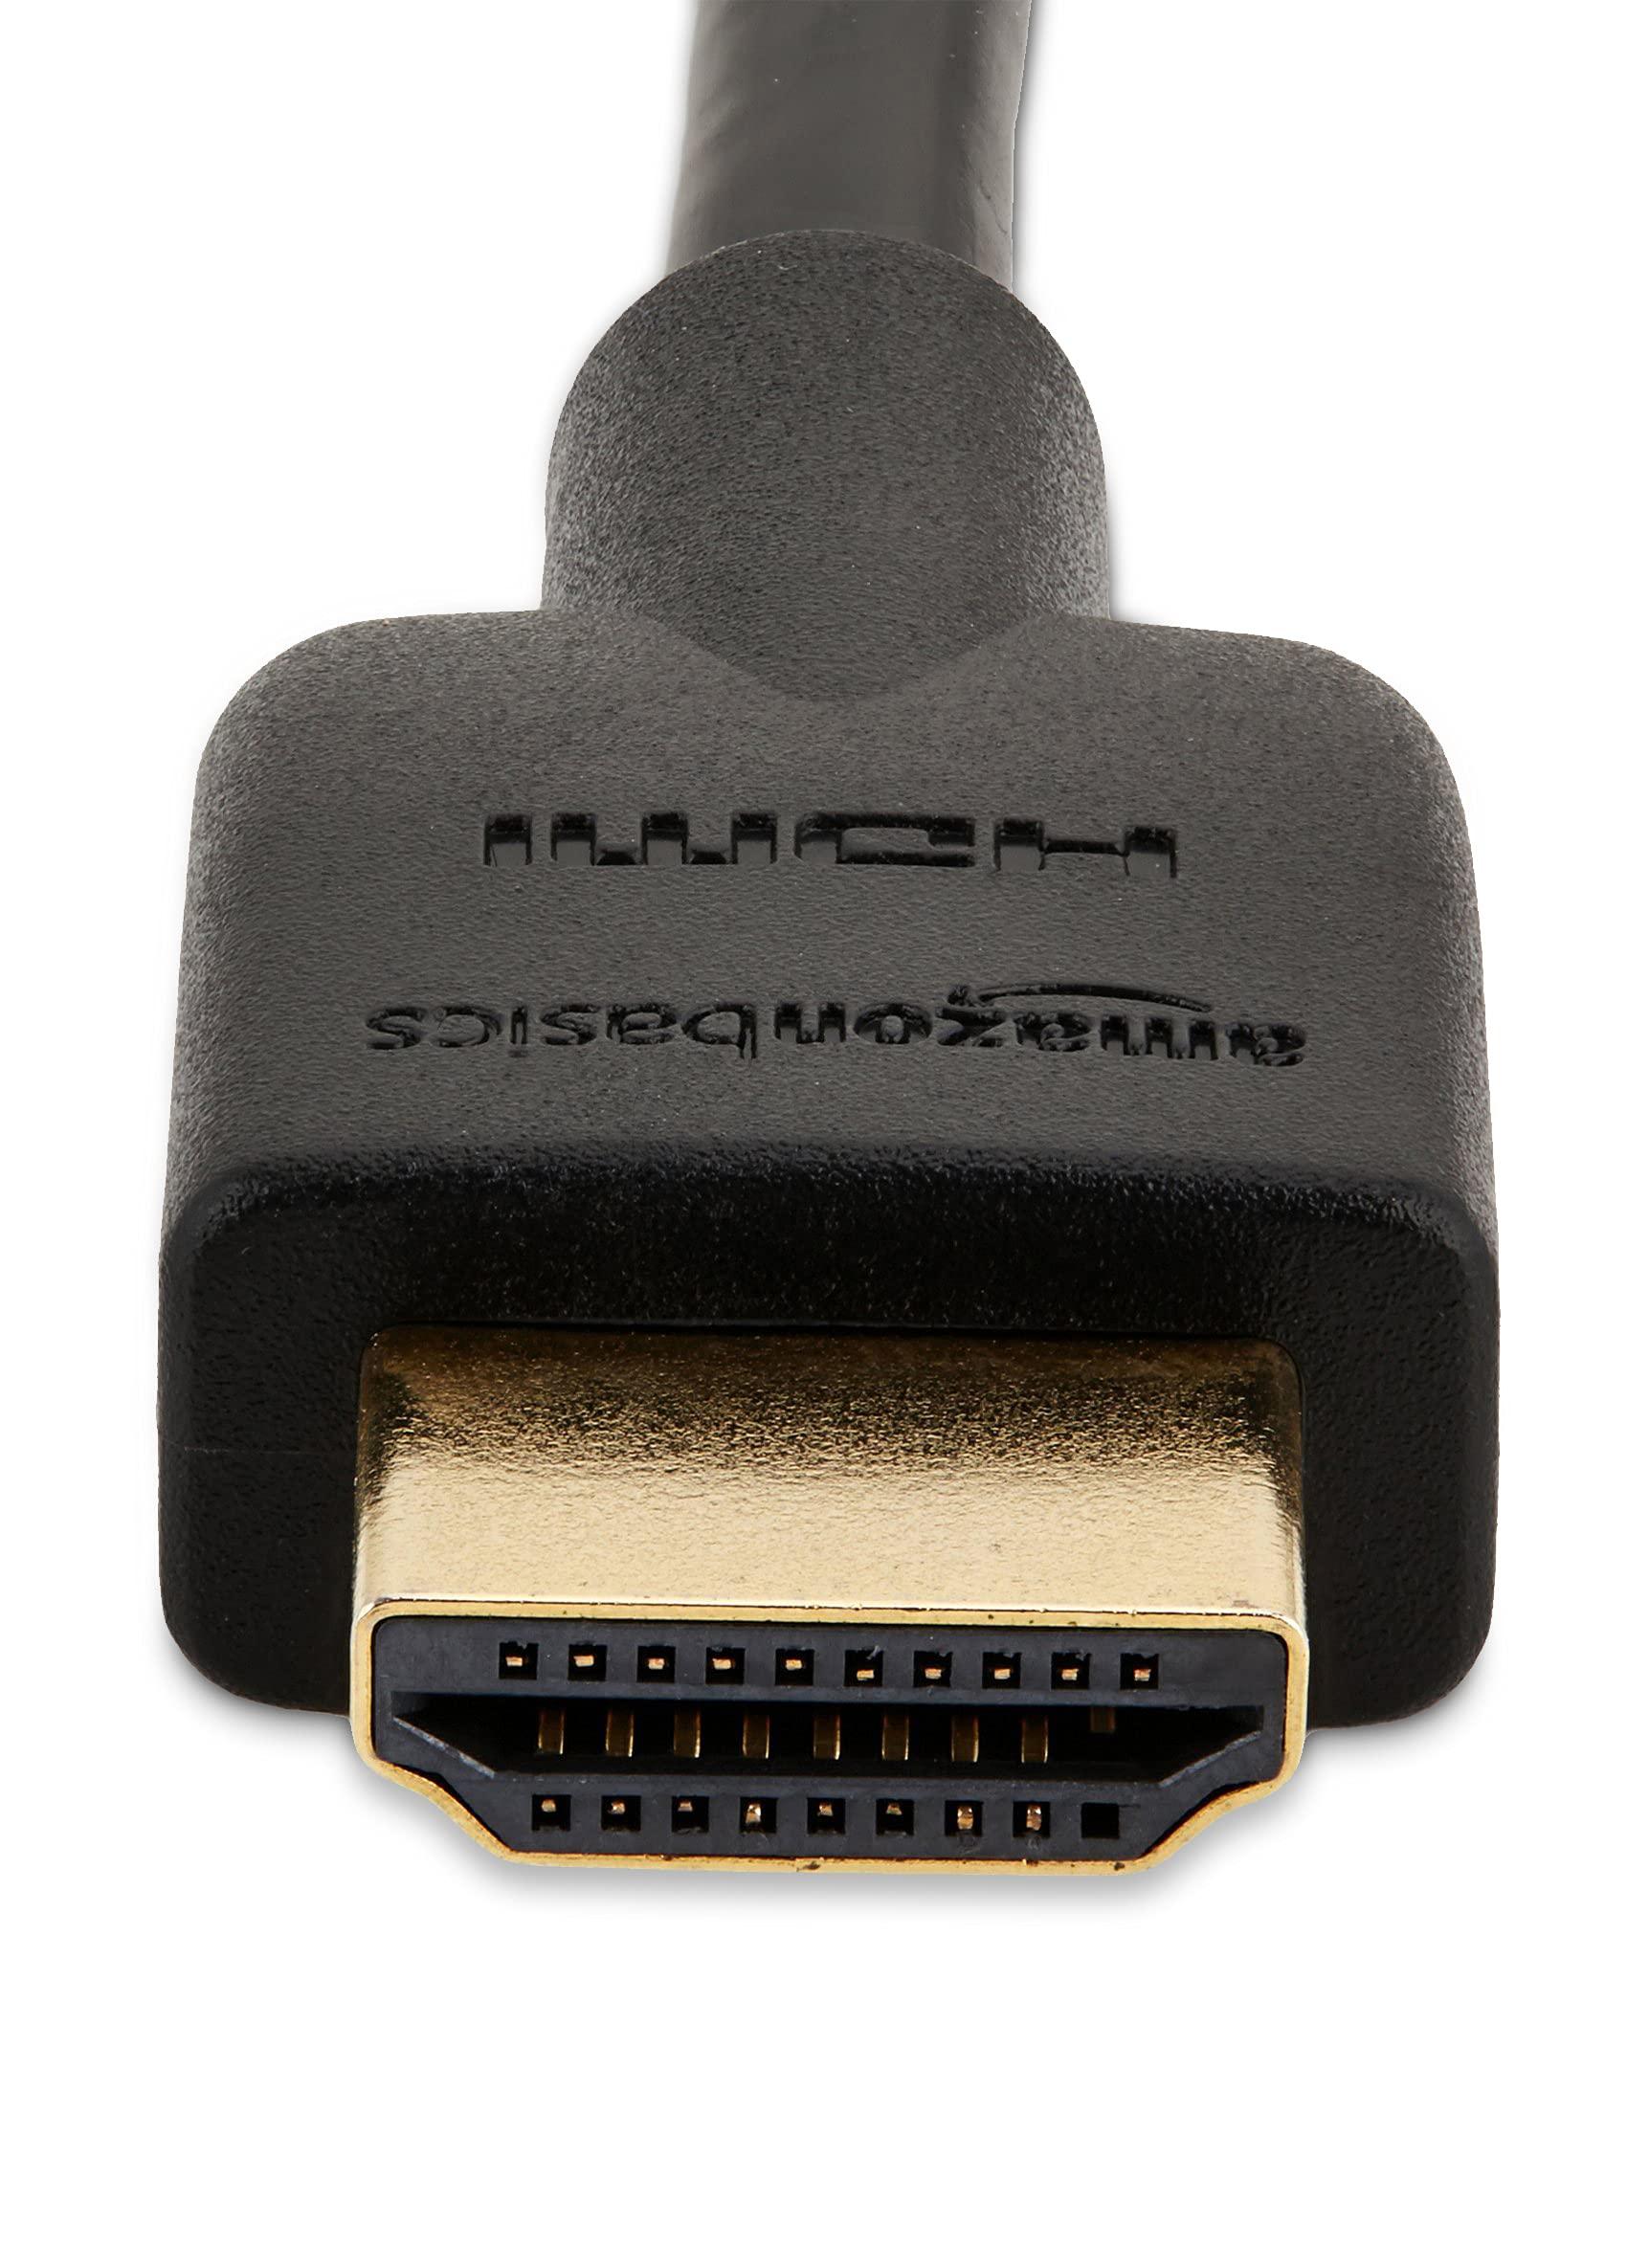 Amazon Basics High-Speed HDMI Cable (18 Gbps, 4K/60Hz) - 6 Feet, Black